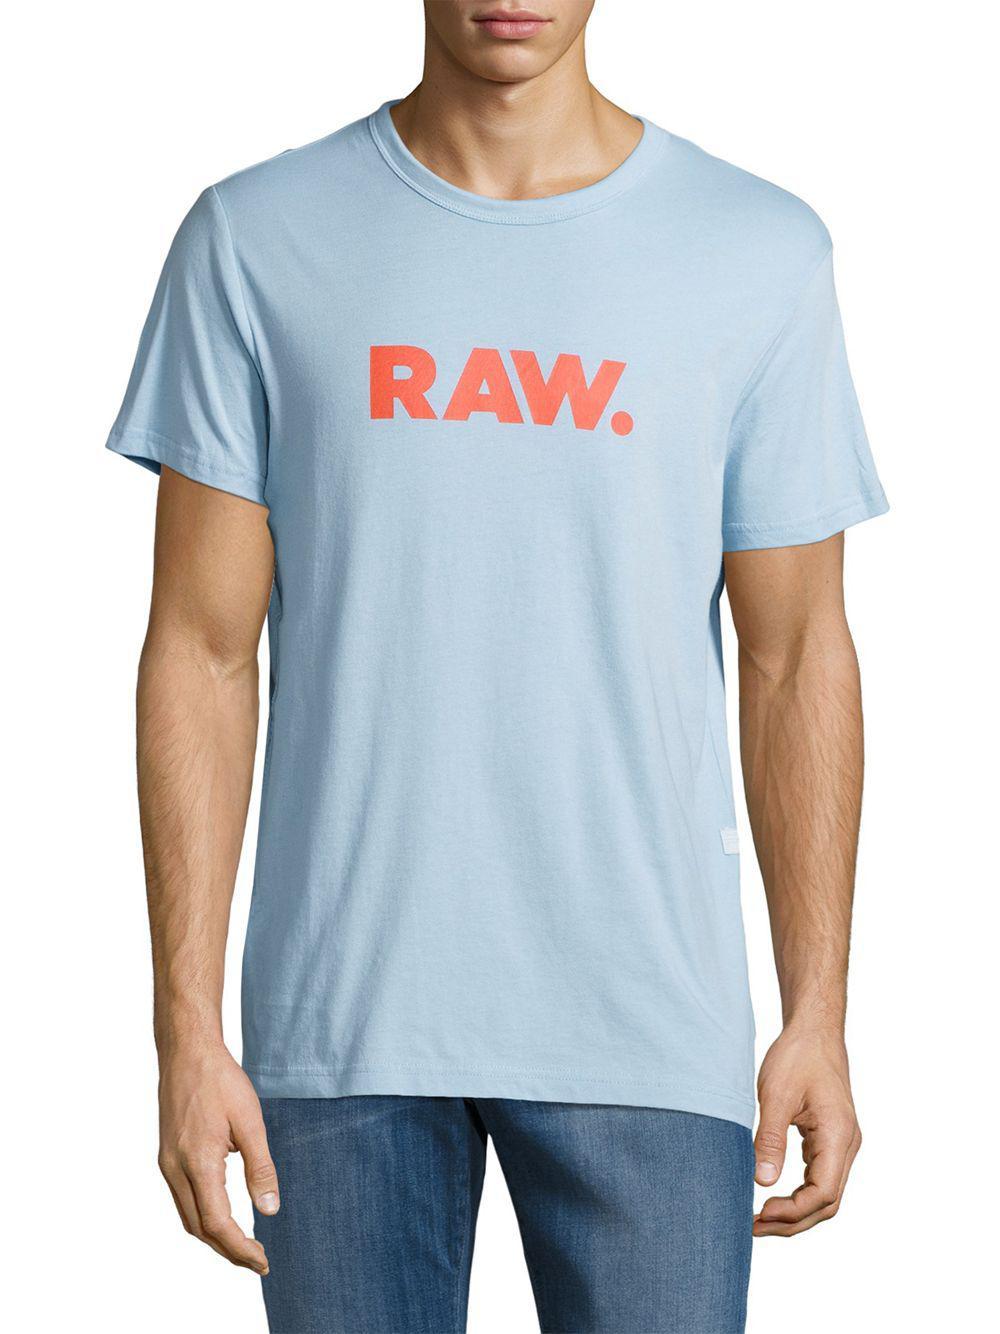 0c0ff5f987 Lyst - G-Star Raw Horlorn Short Sleeved Tee in Blue for Men